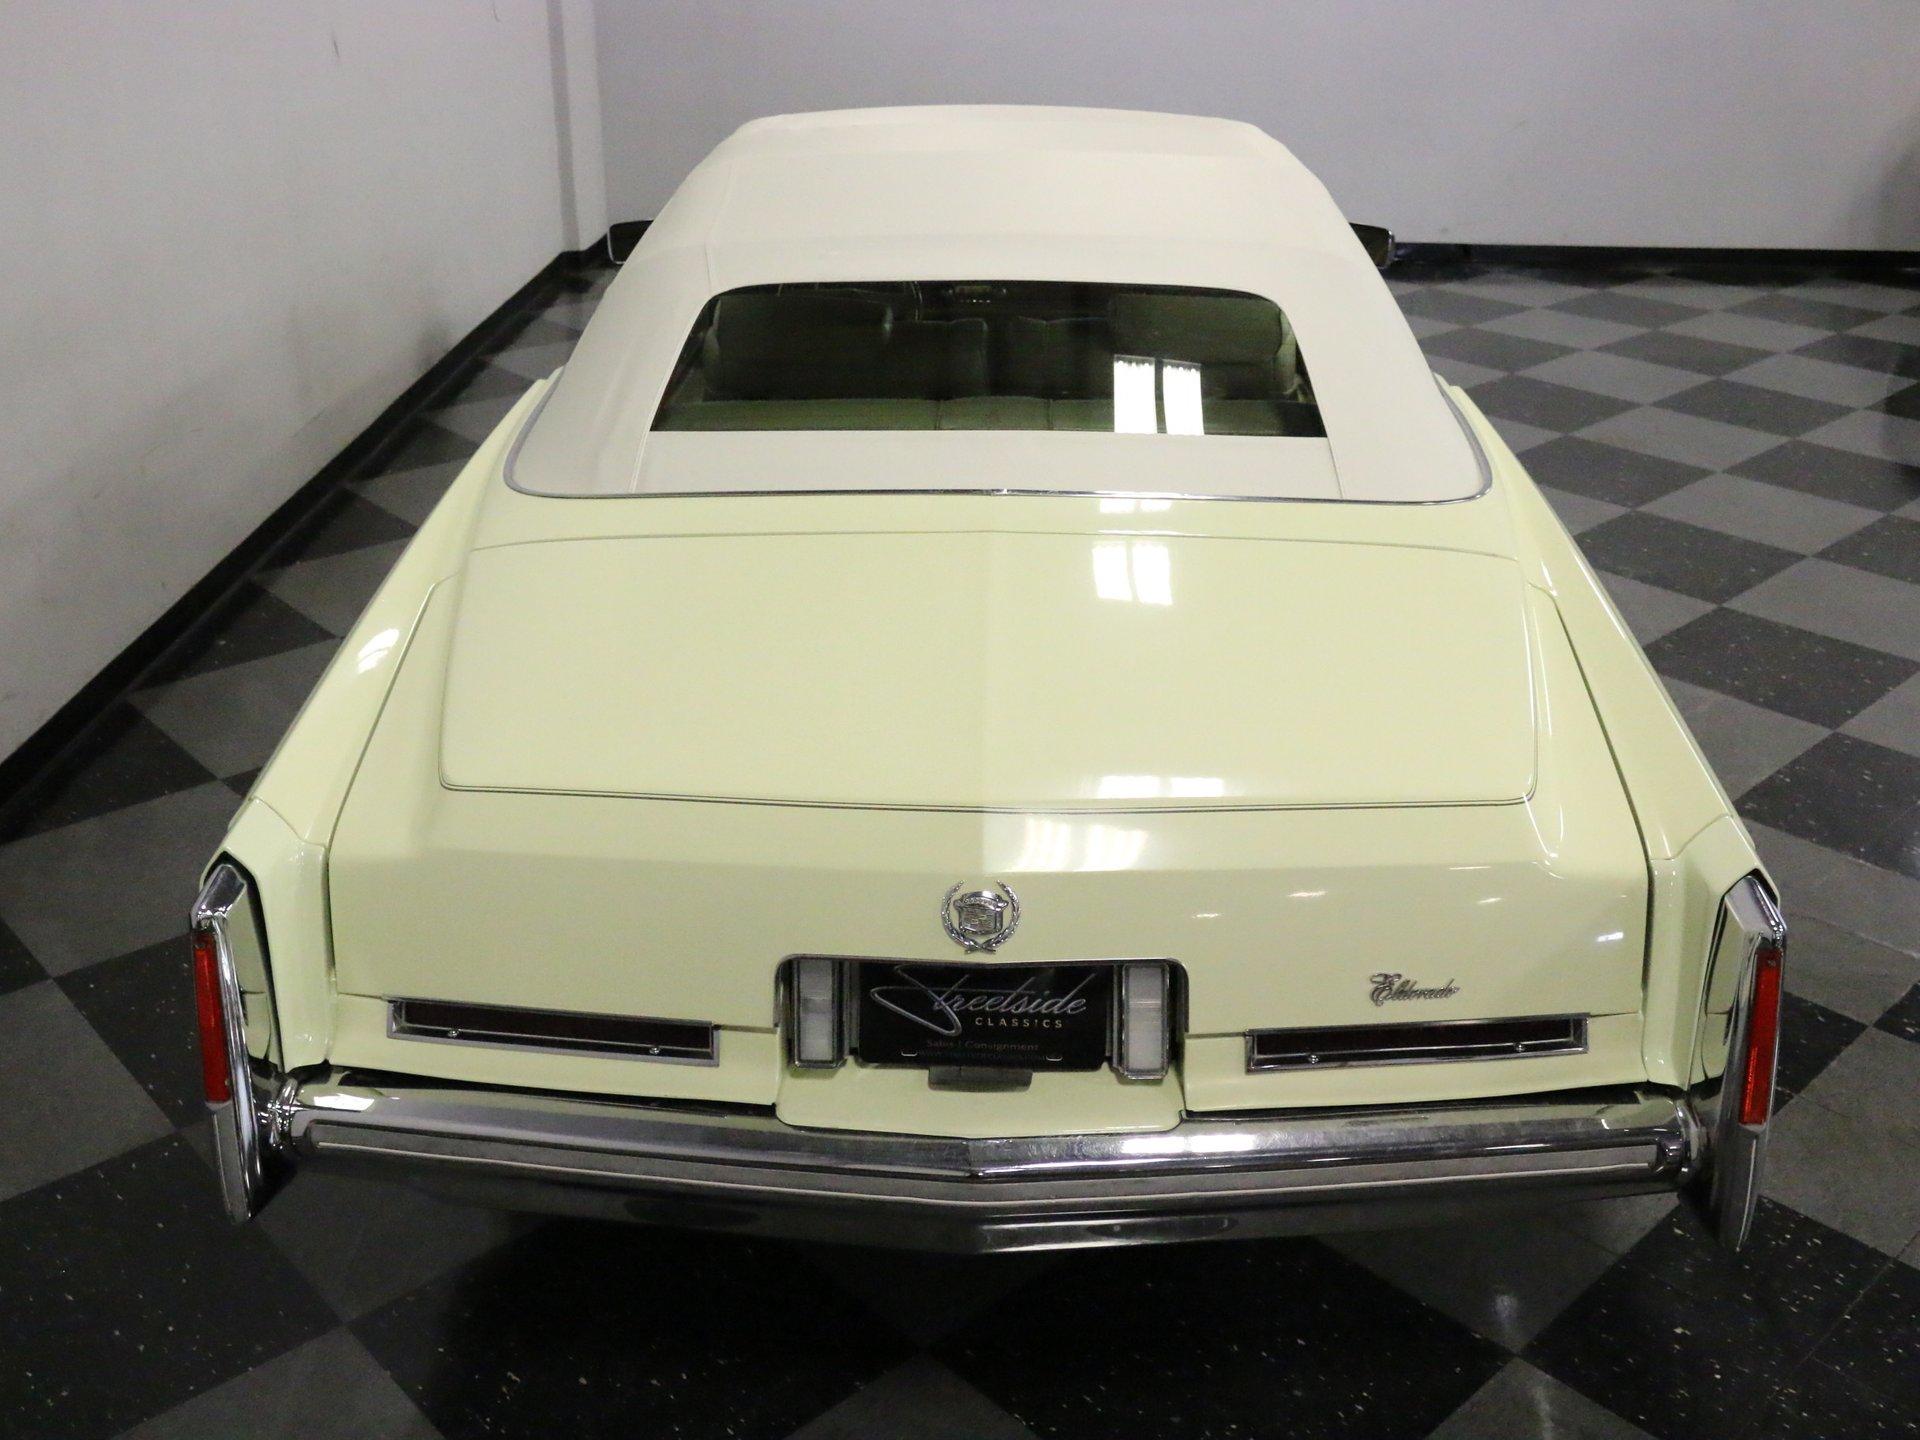 1976 Cadillac Eldorado   Streetside Classics - The Nation's Trusted